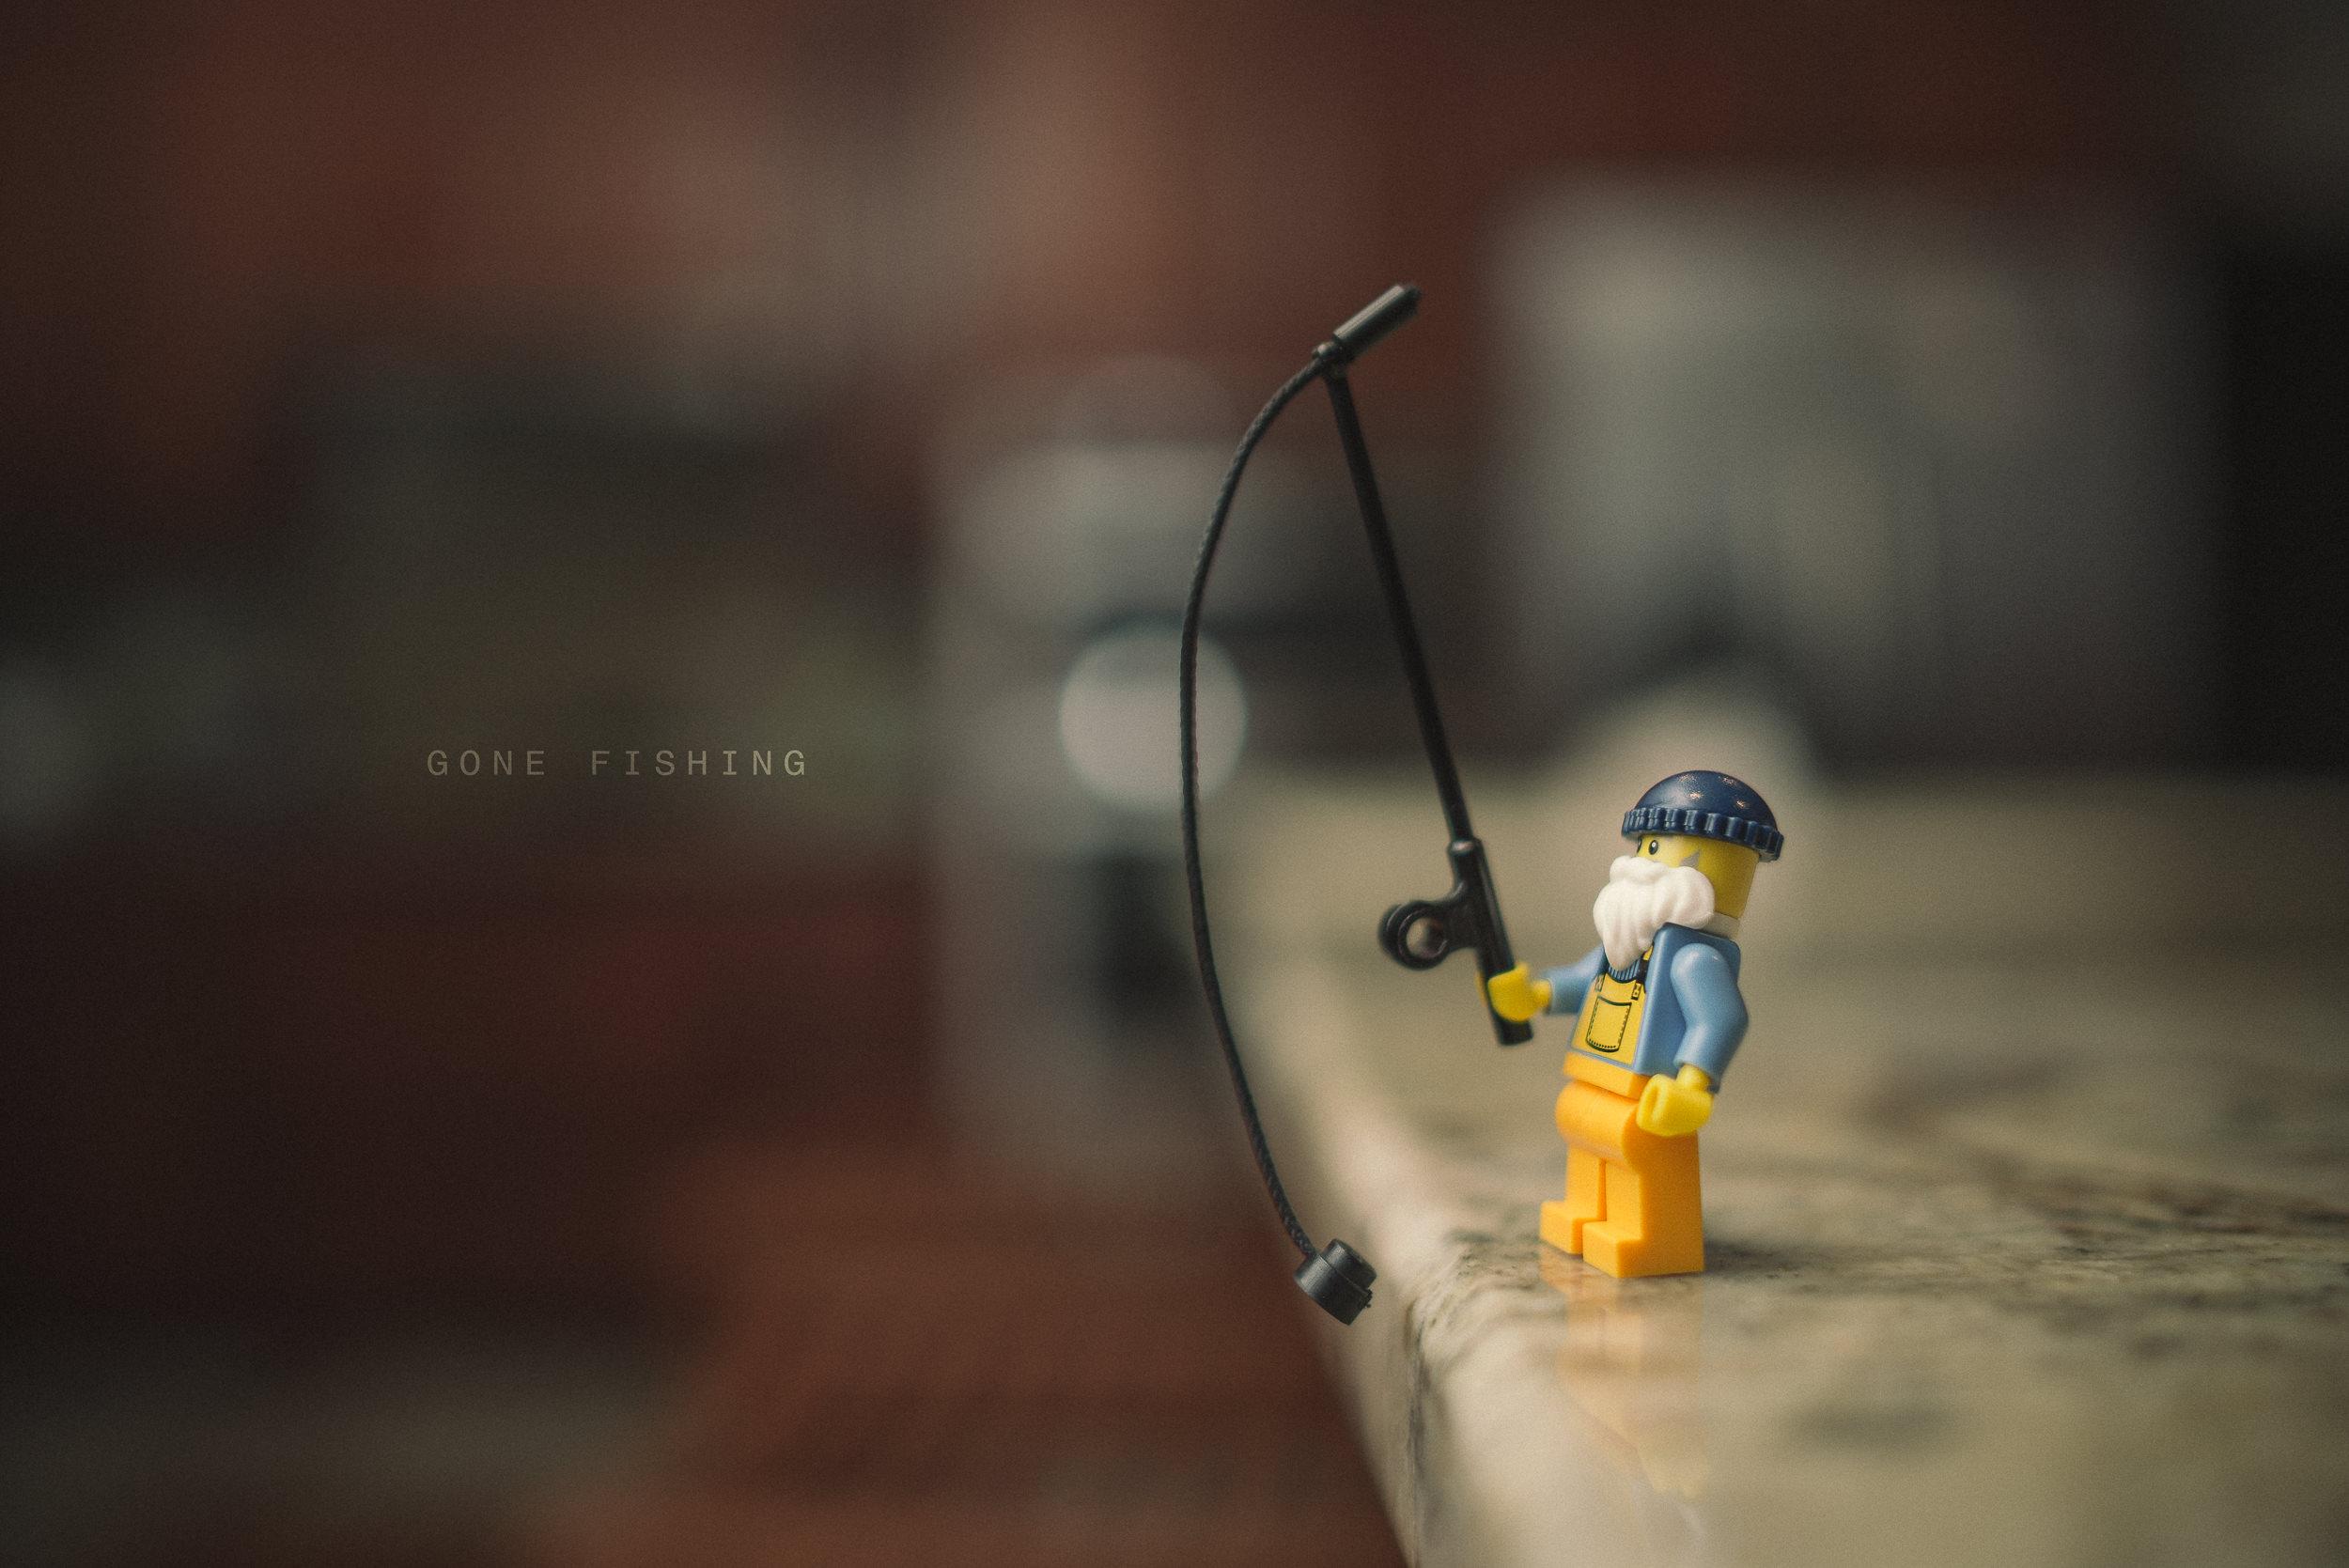 Lego-Portrait-Series-Reggie-Ballesteros-0009.jpg